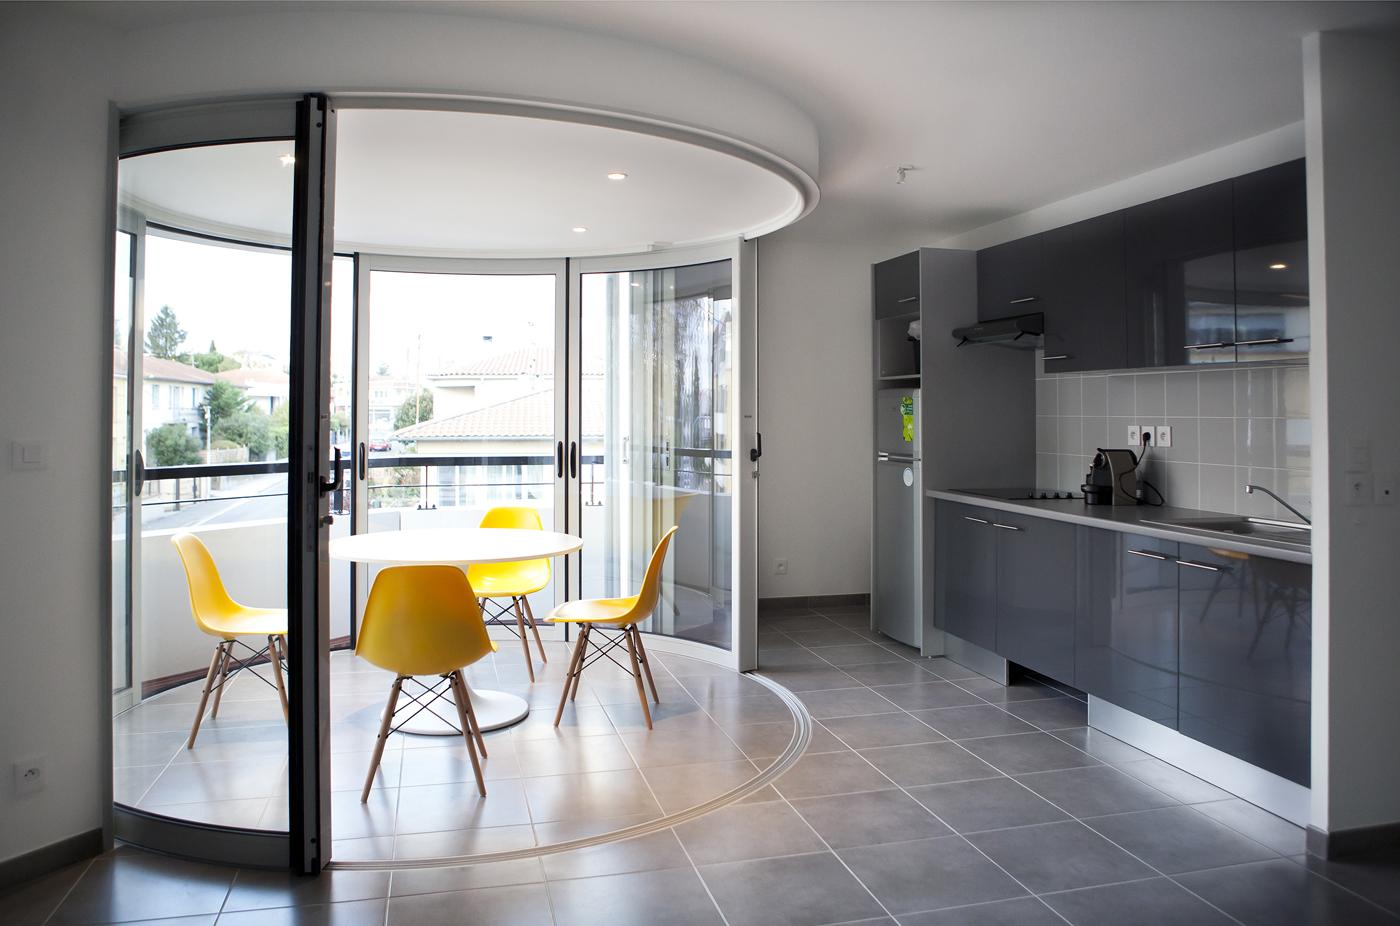 lumicene parois vitr es entre terrasse v randa et bow. Black Bedroom Furniture Sets. Home Design Ideas